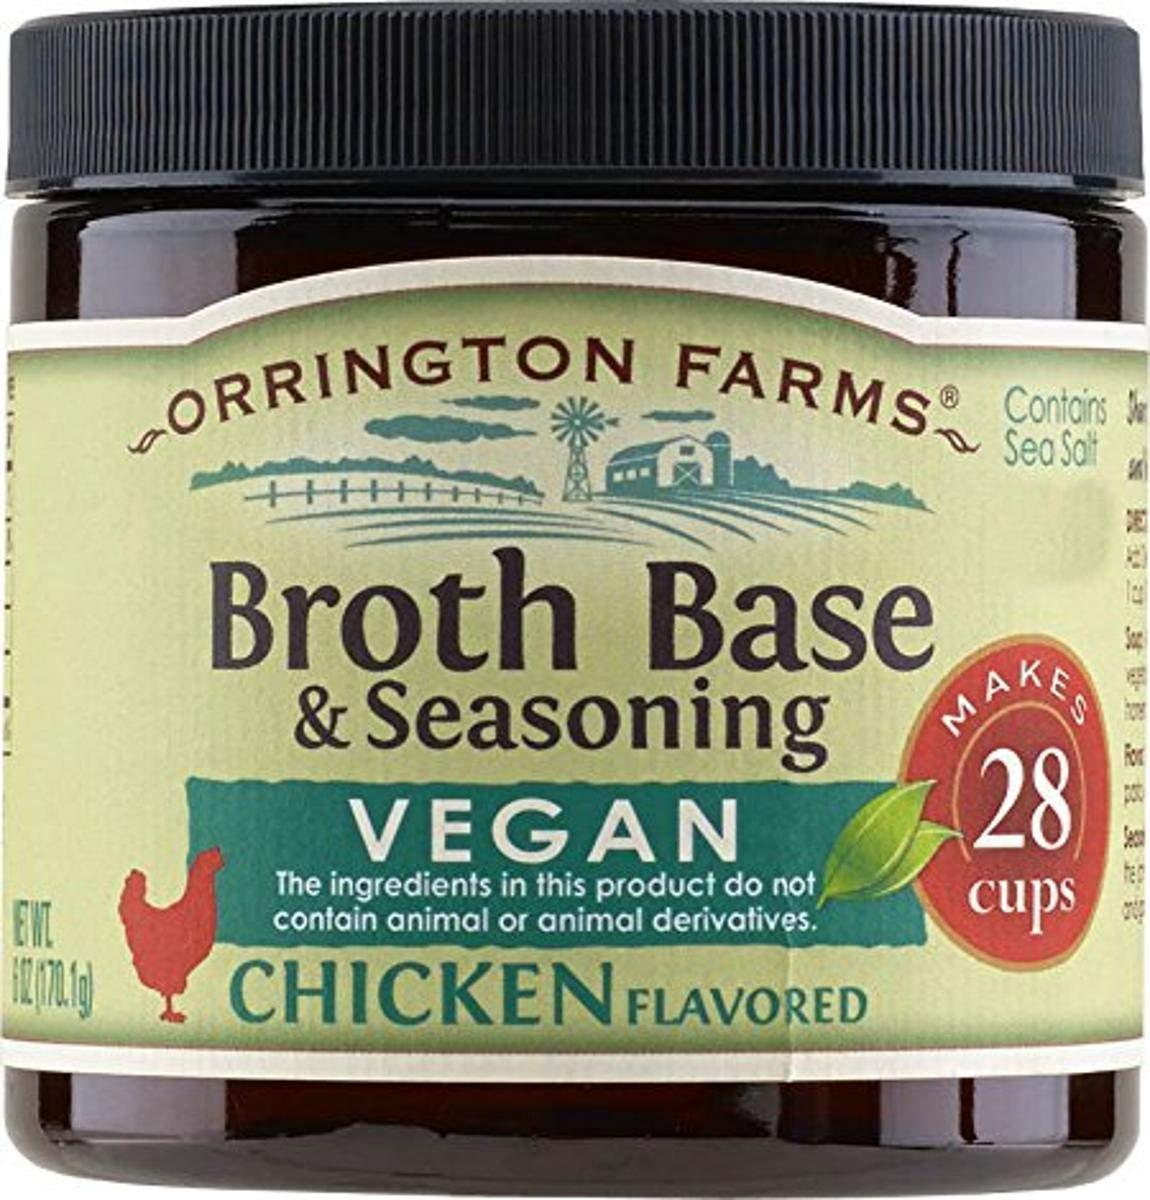 Orrington Farms All Natural Broth Base Seasoning, Vegan Chicken, 6 Ounce